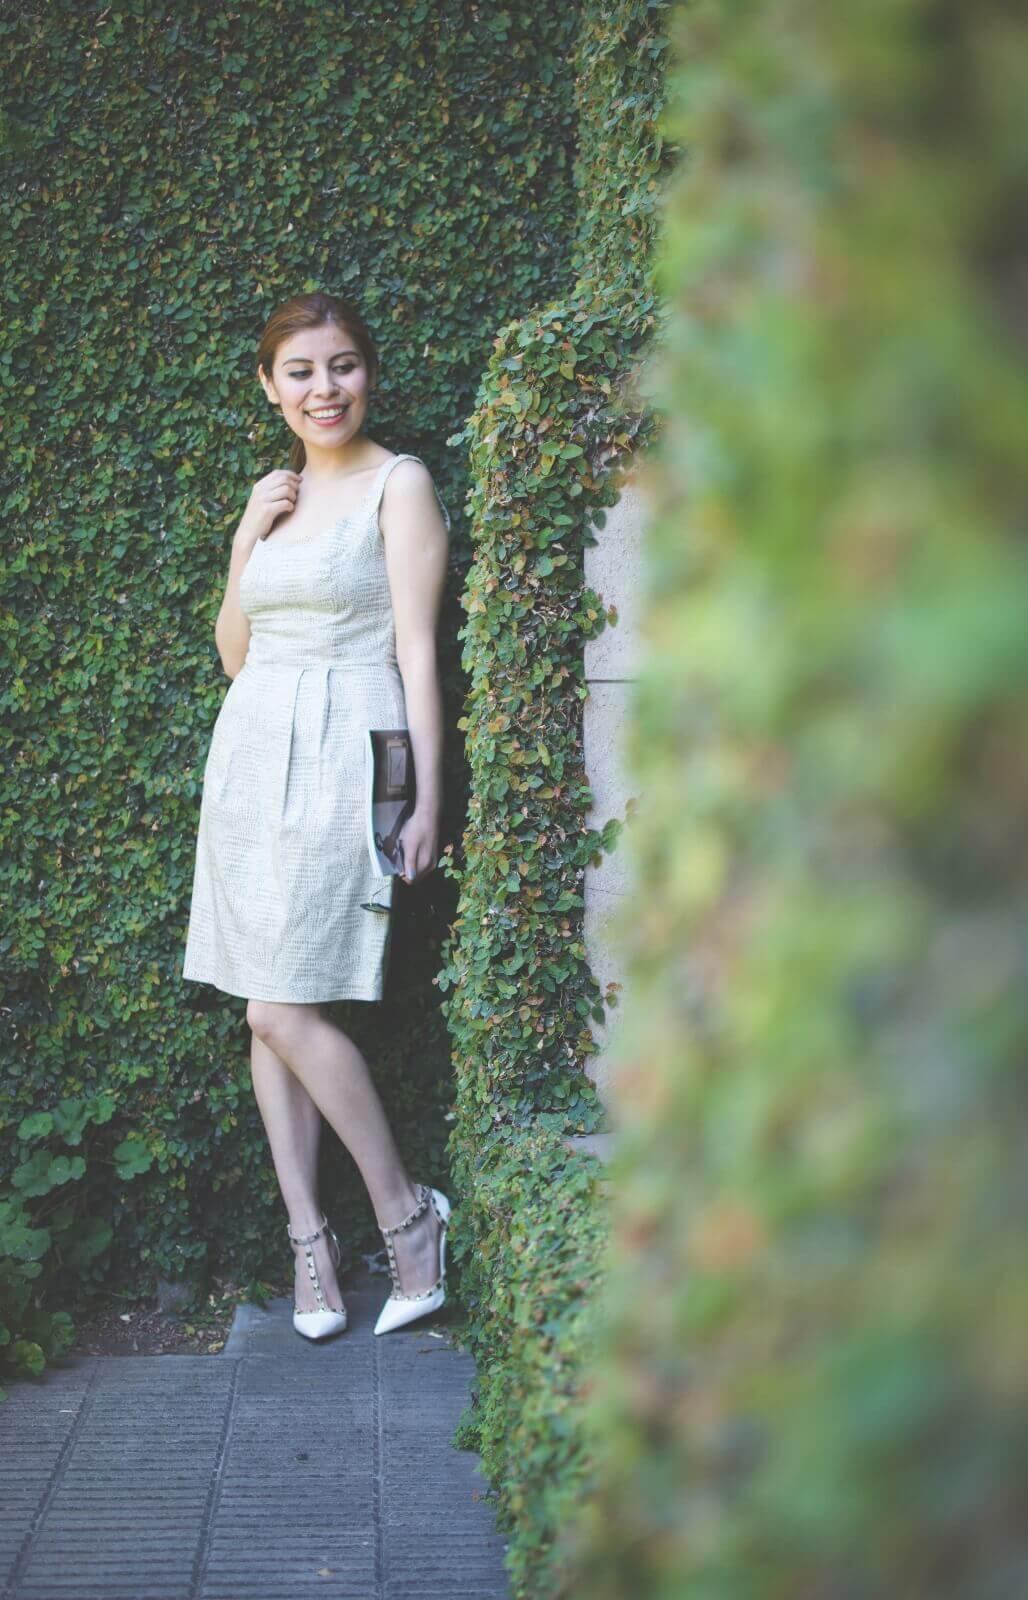 almond-white-dress-sammydress-stilettos-valentino-rockstud-imitation-deborah-ferrero-style-by-deb-ladylike12